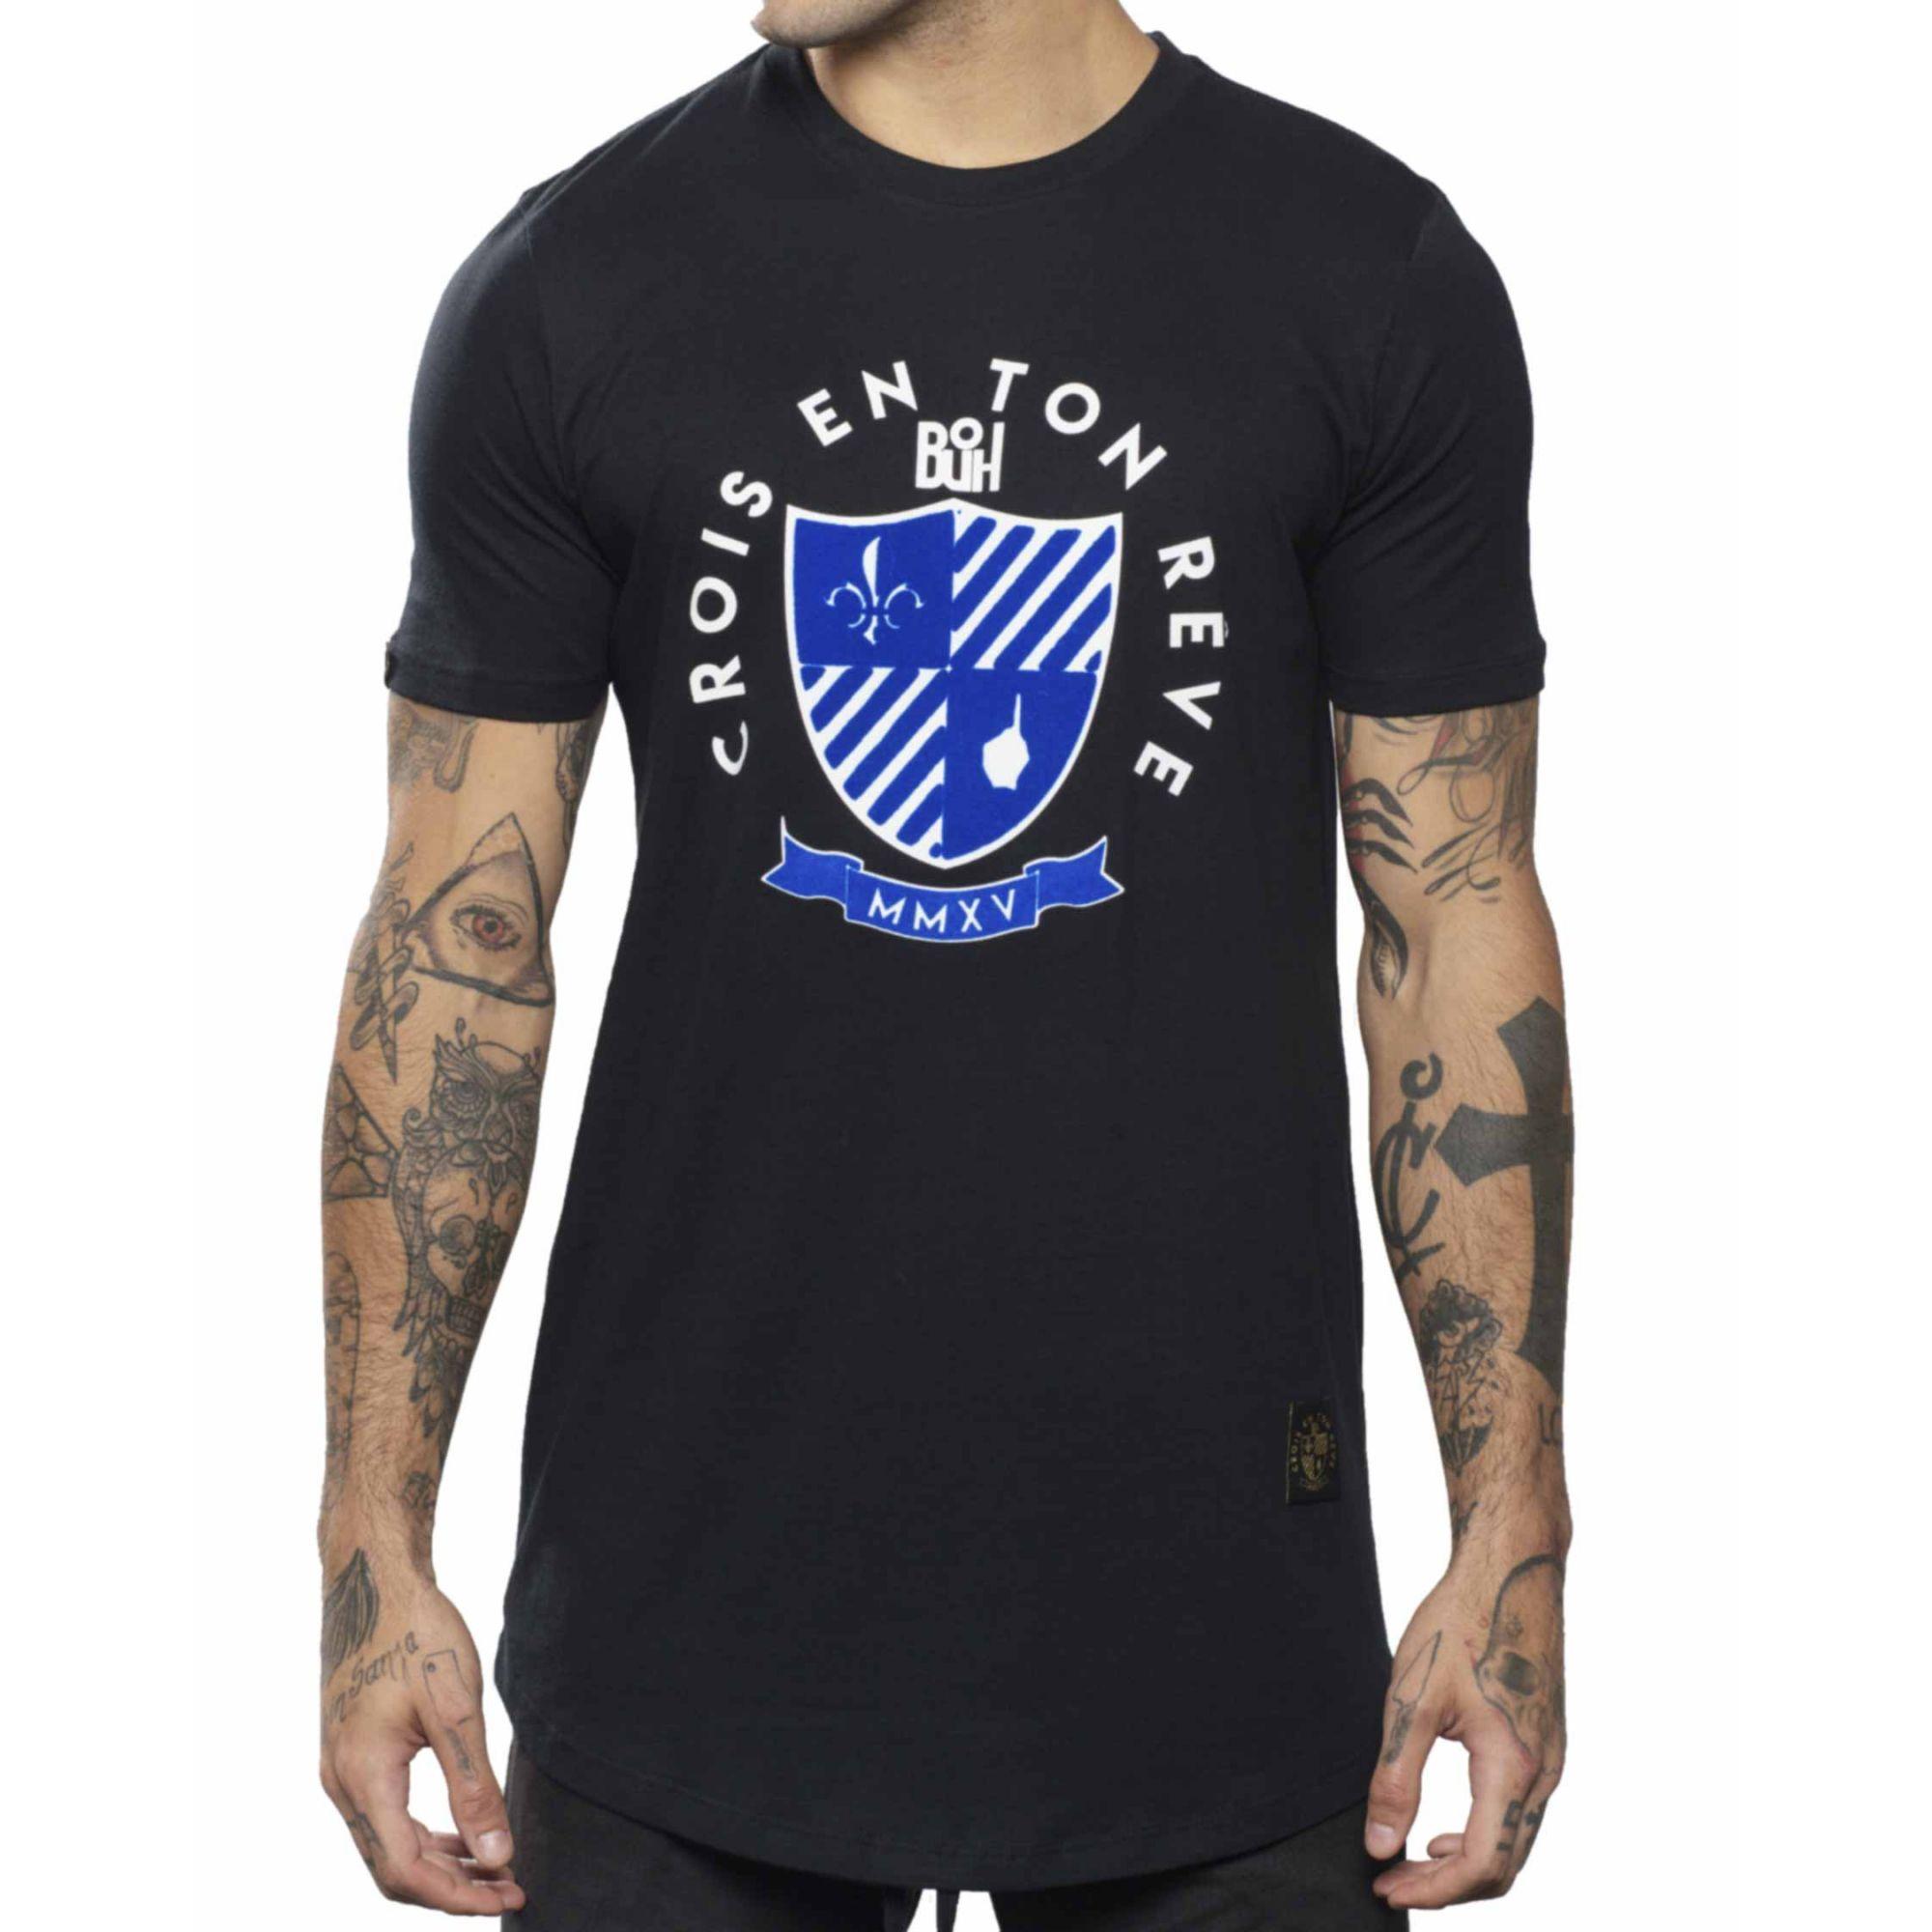 Camiseta Buh MMXV Relevo Black